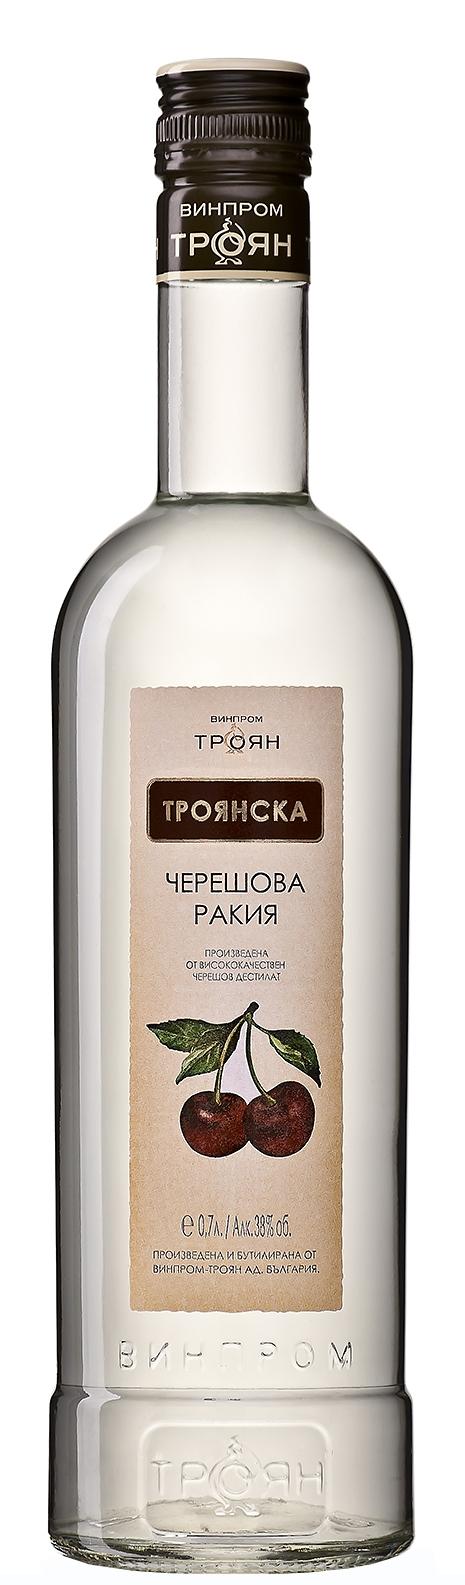 Троянска Черешова Ракия 0.7 л